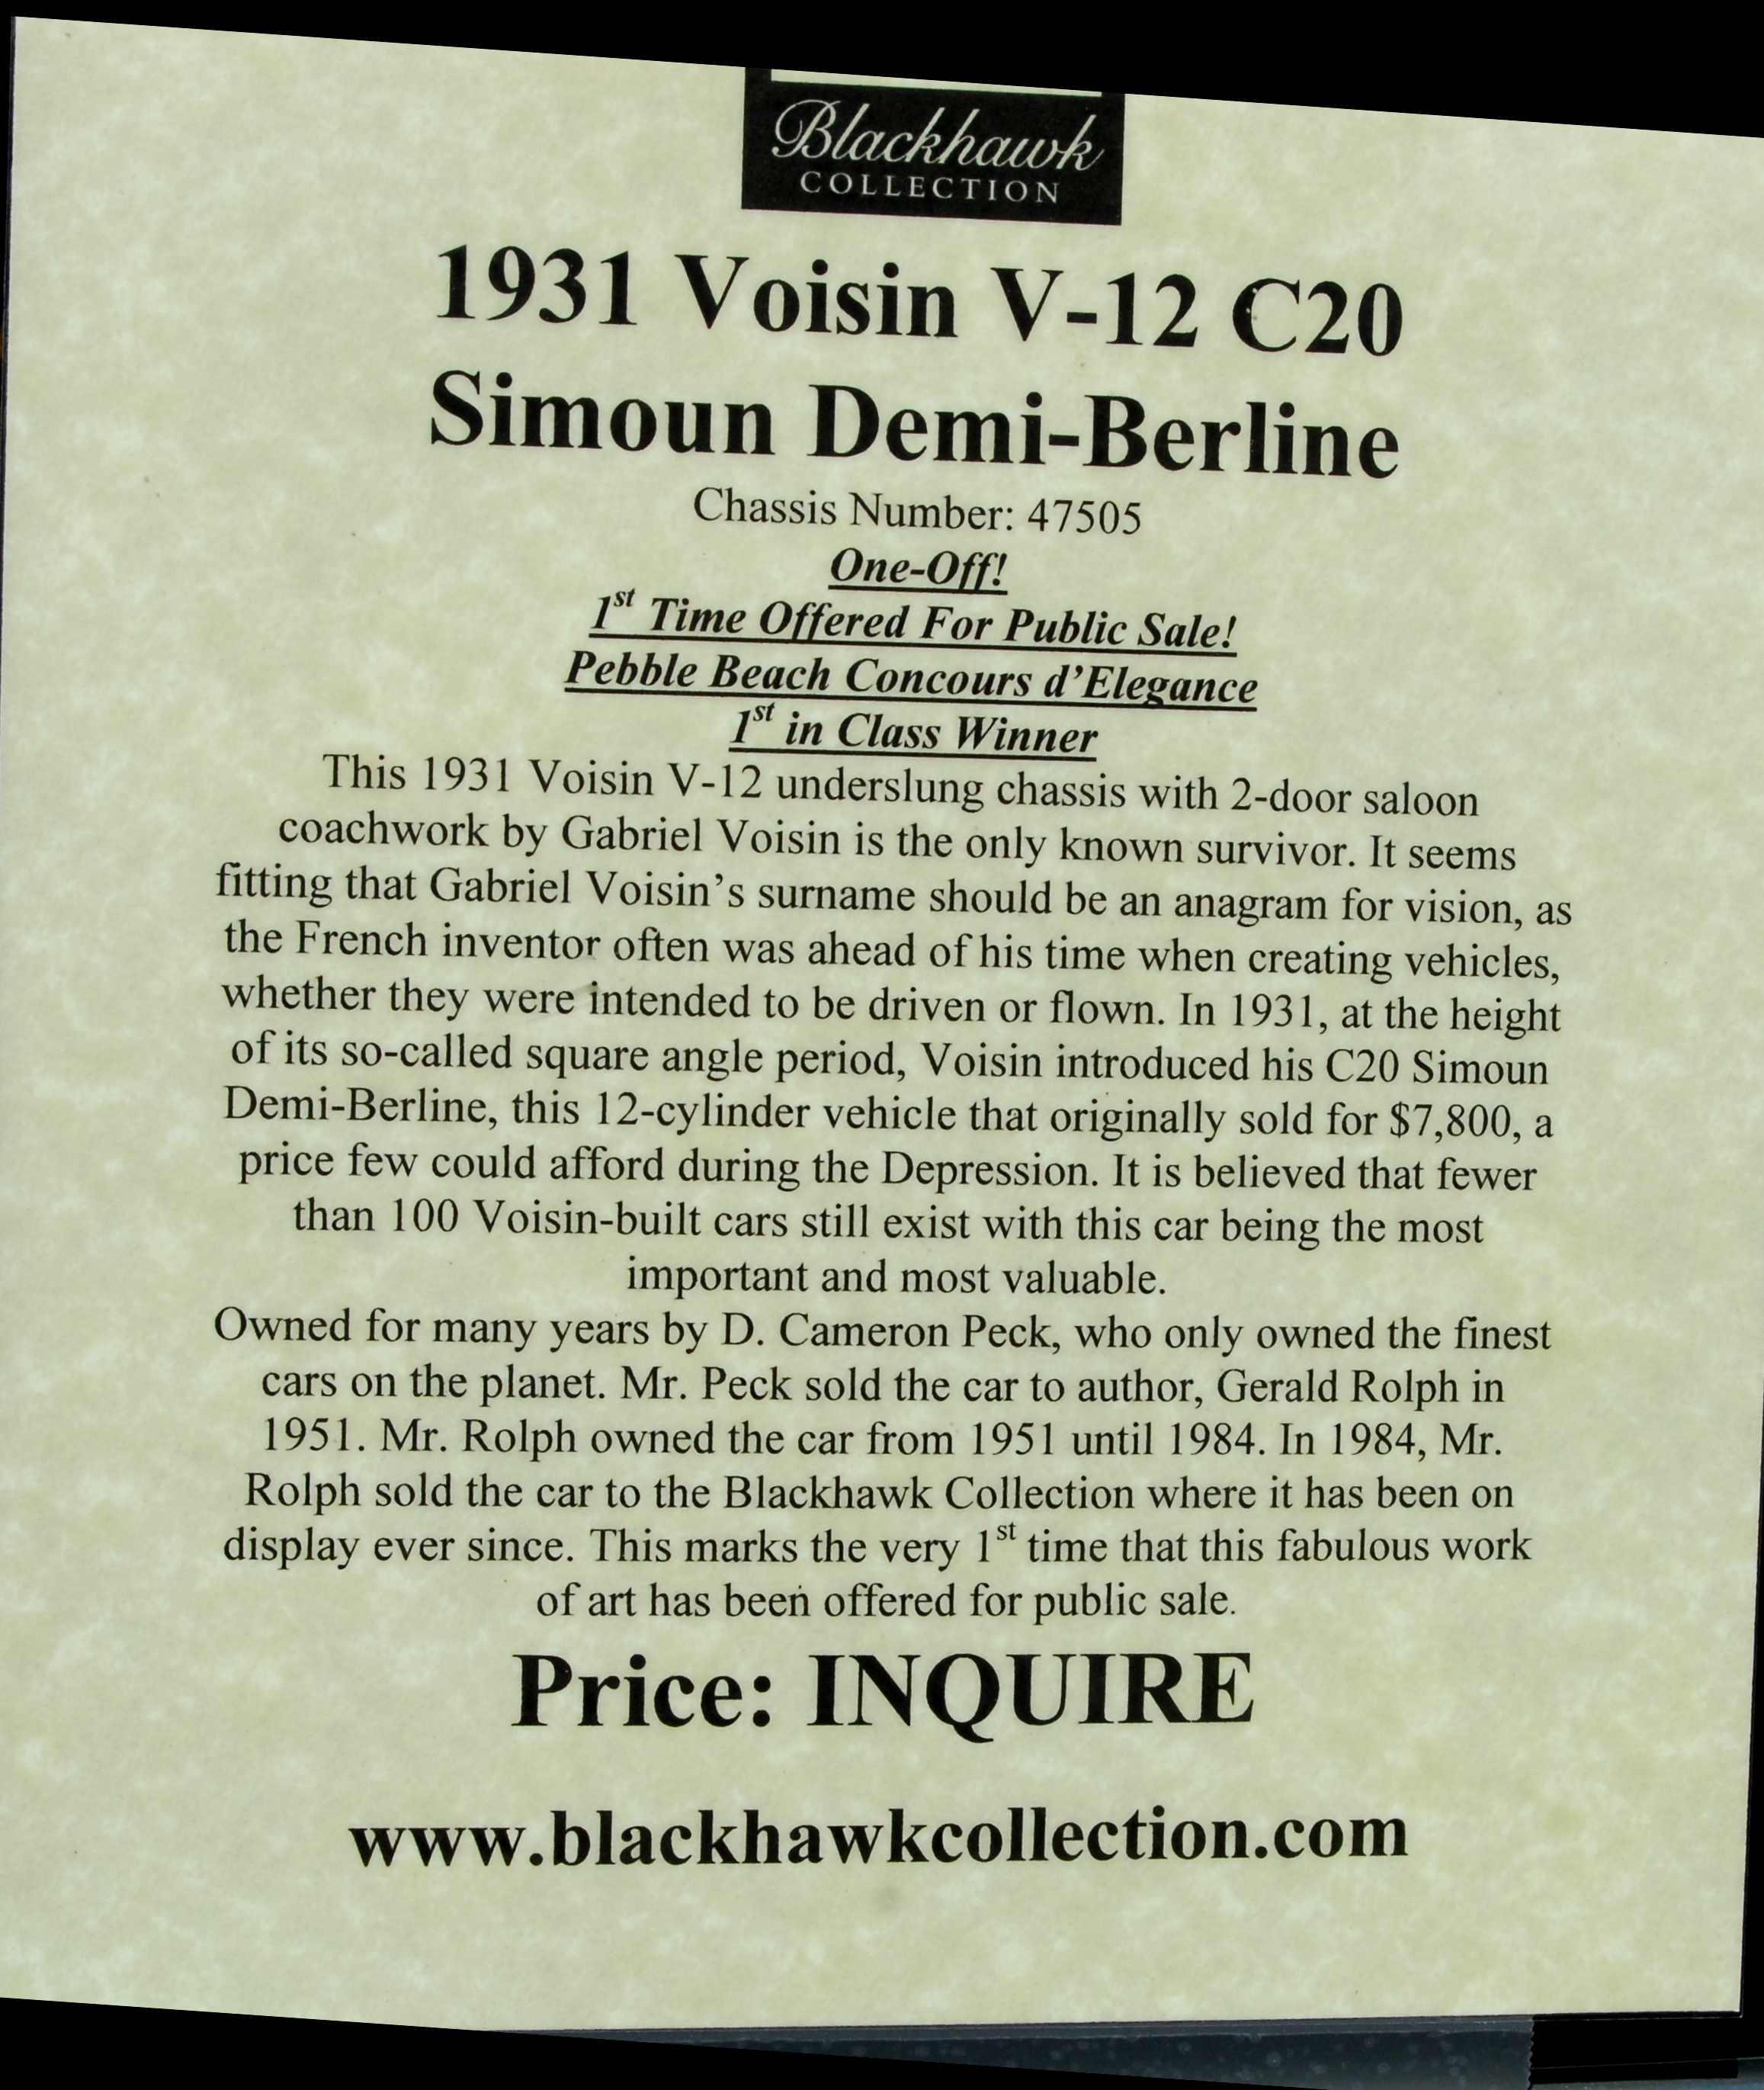 Amazing 1931 Voisin C20 Pictures & Backgrounds